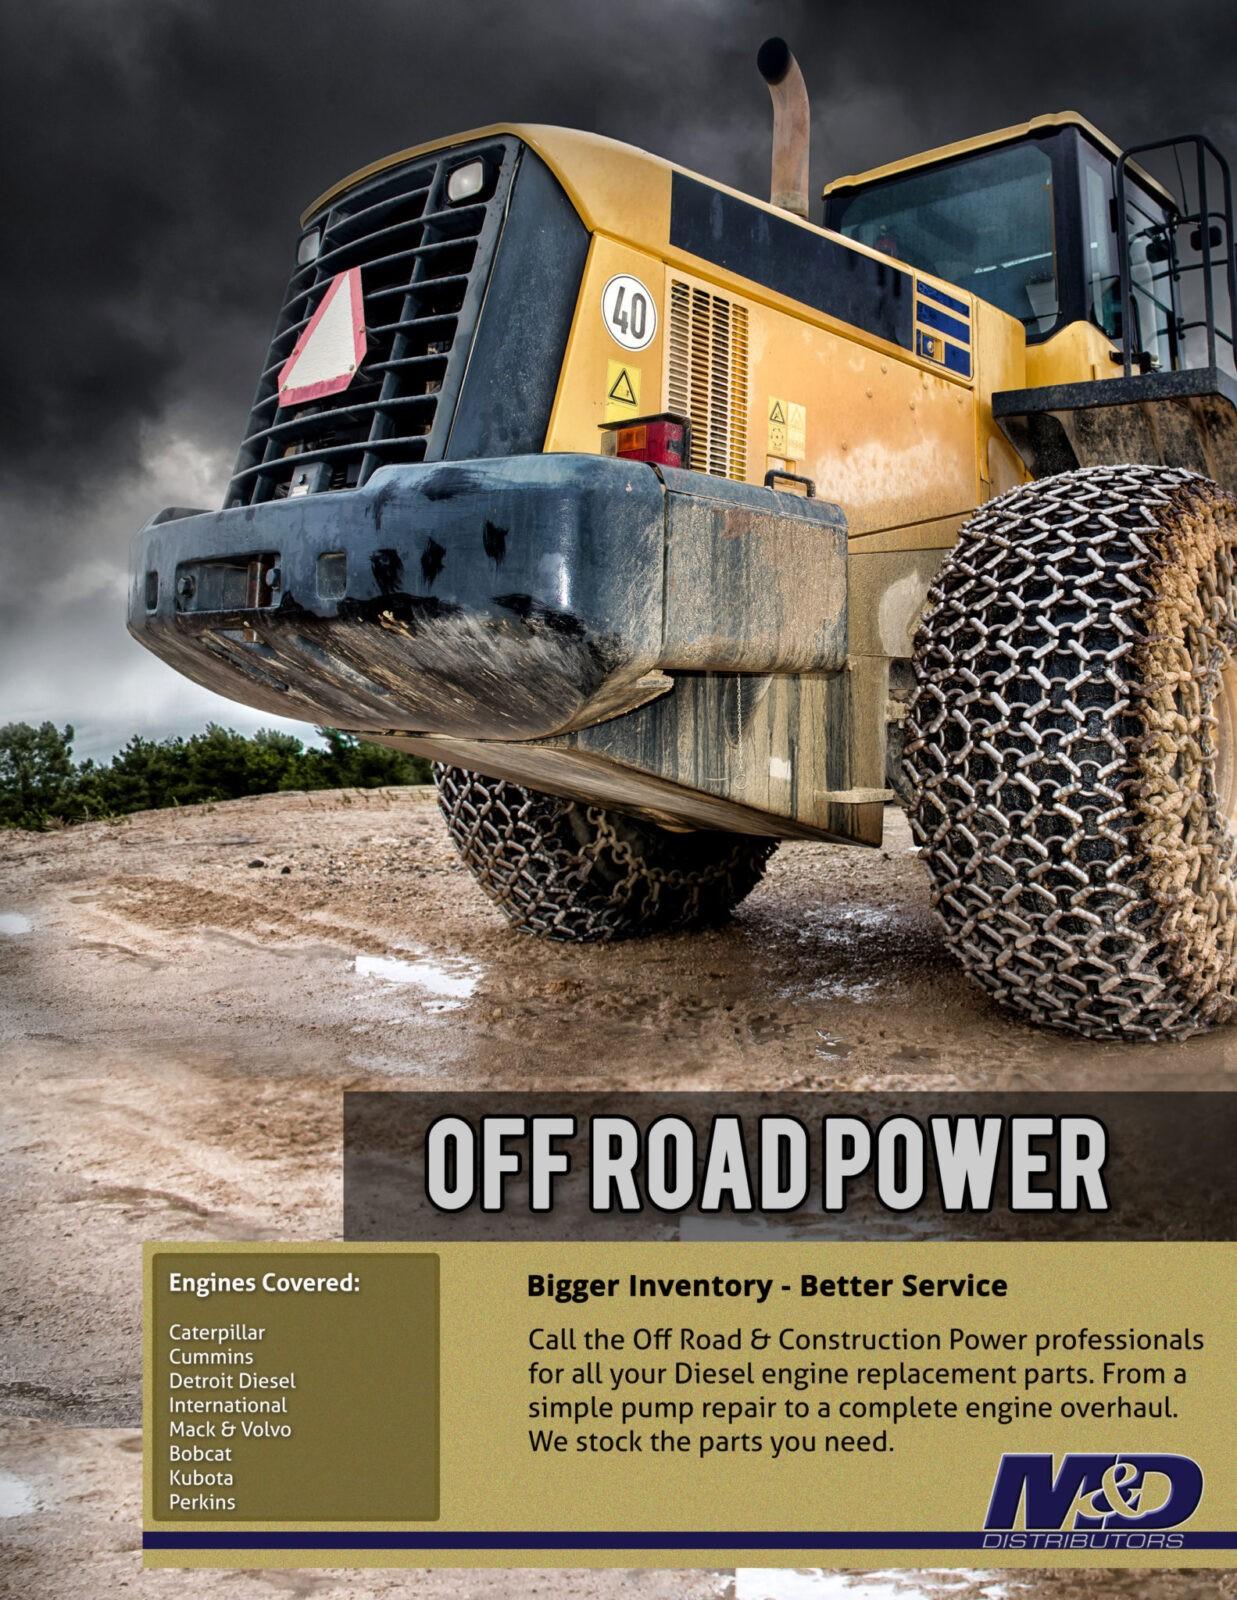 Off Road Power Diesel Engine Parts